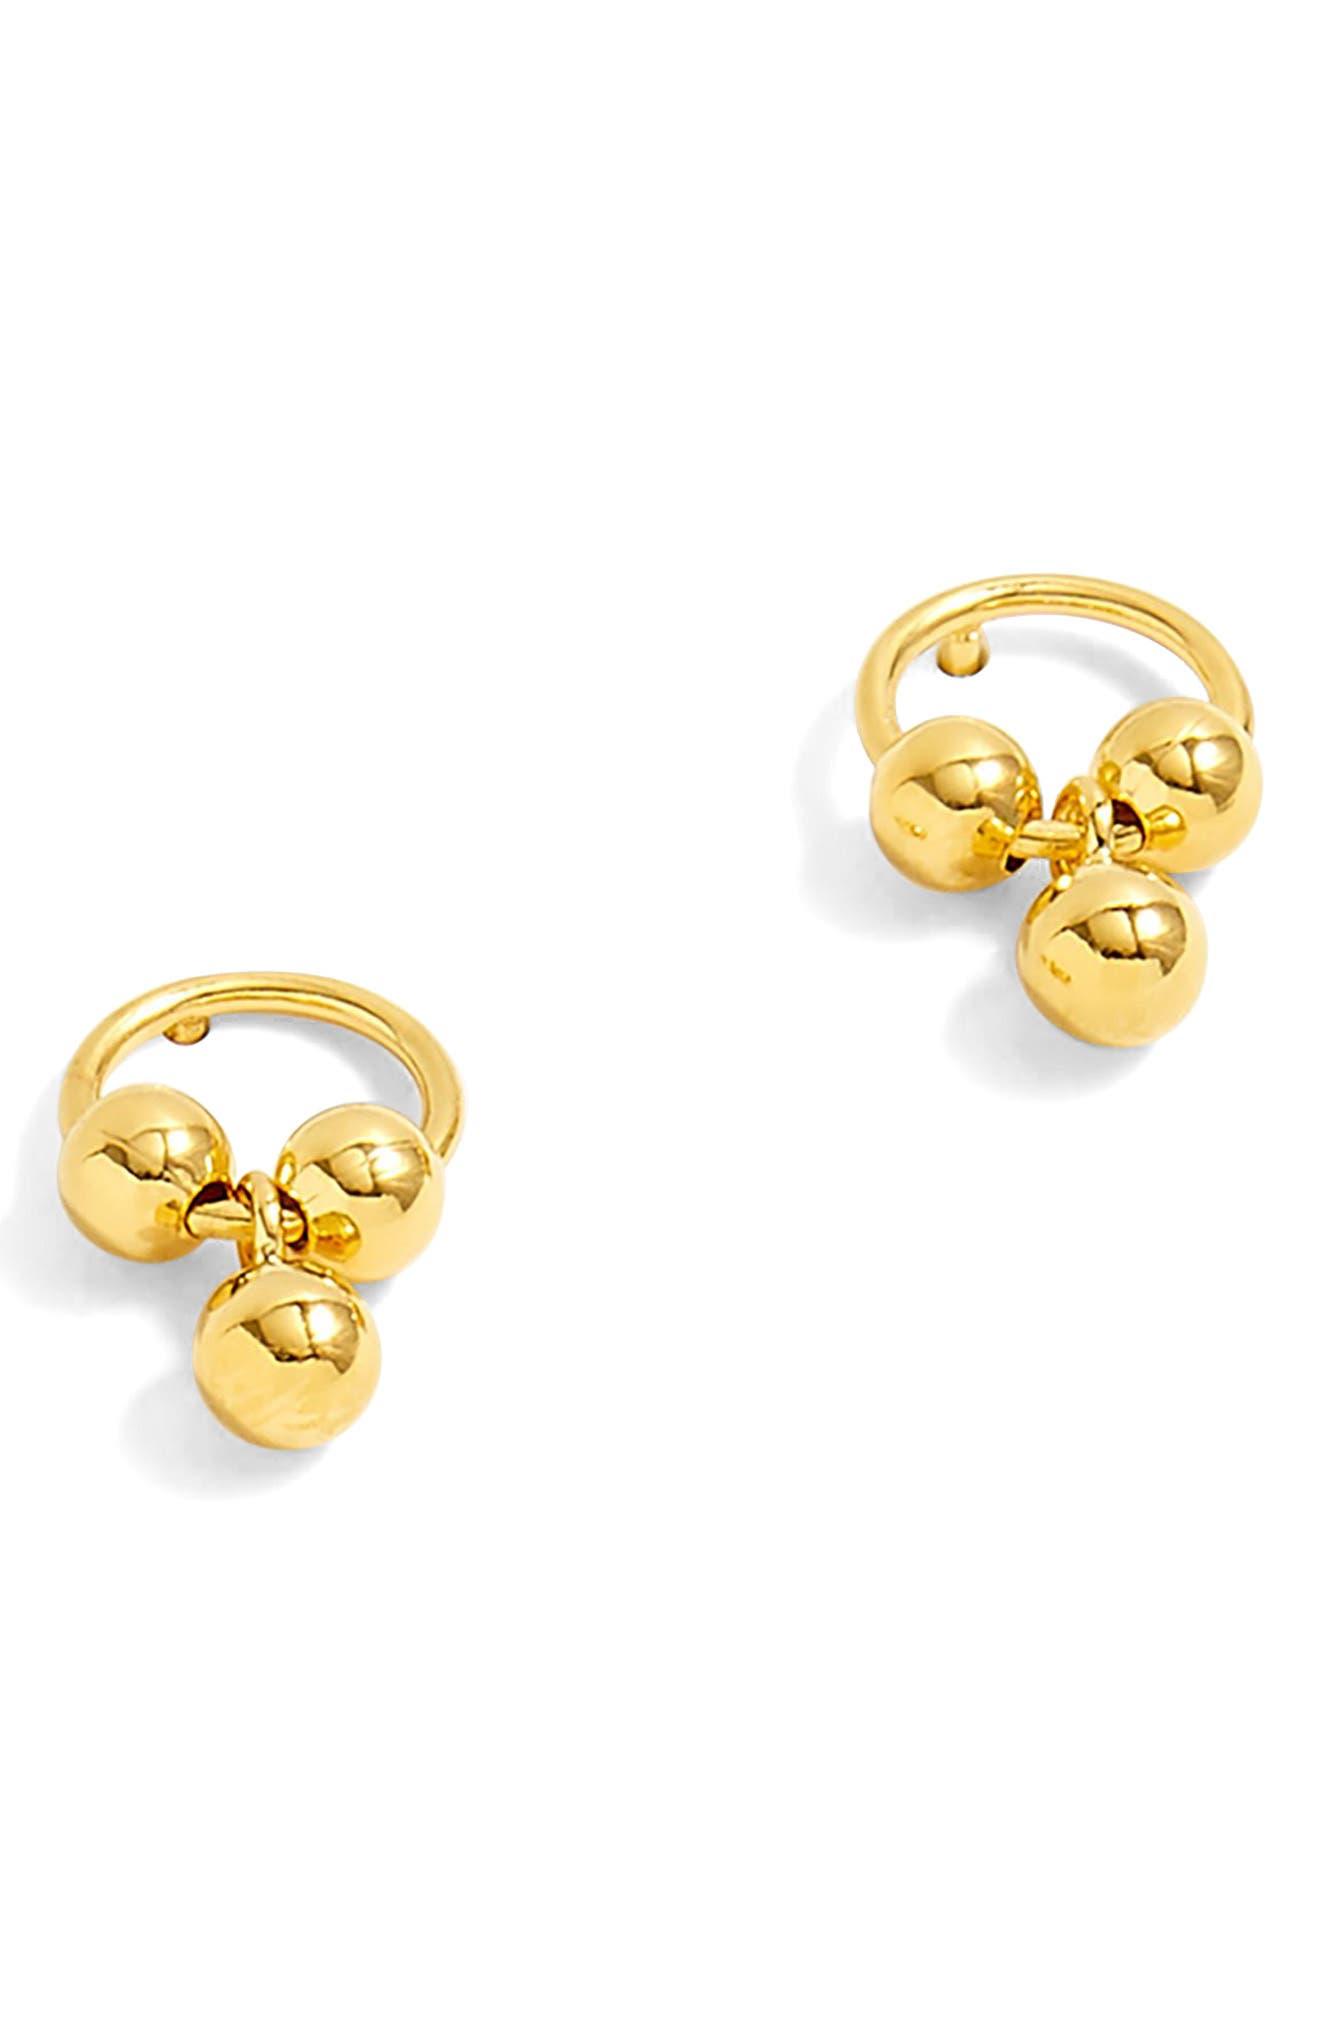 Sweet Pea Earrings,                         Main,                         color, 710